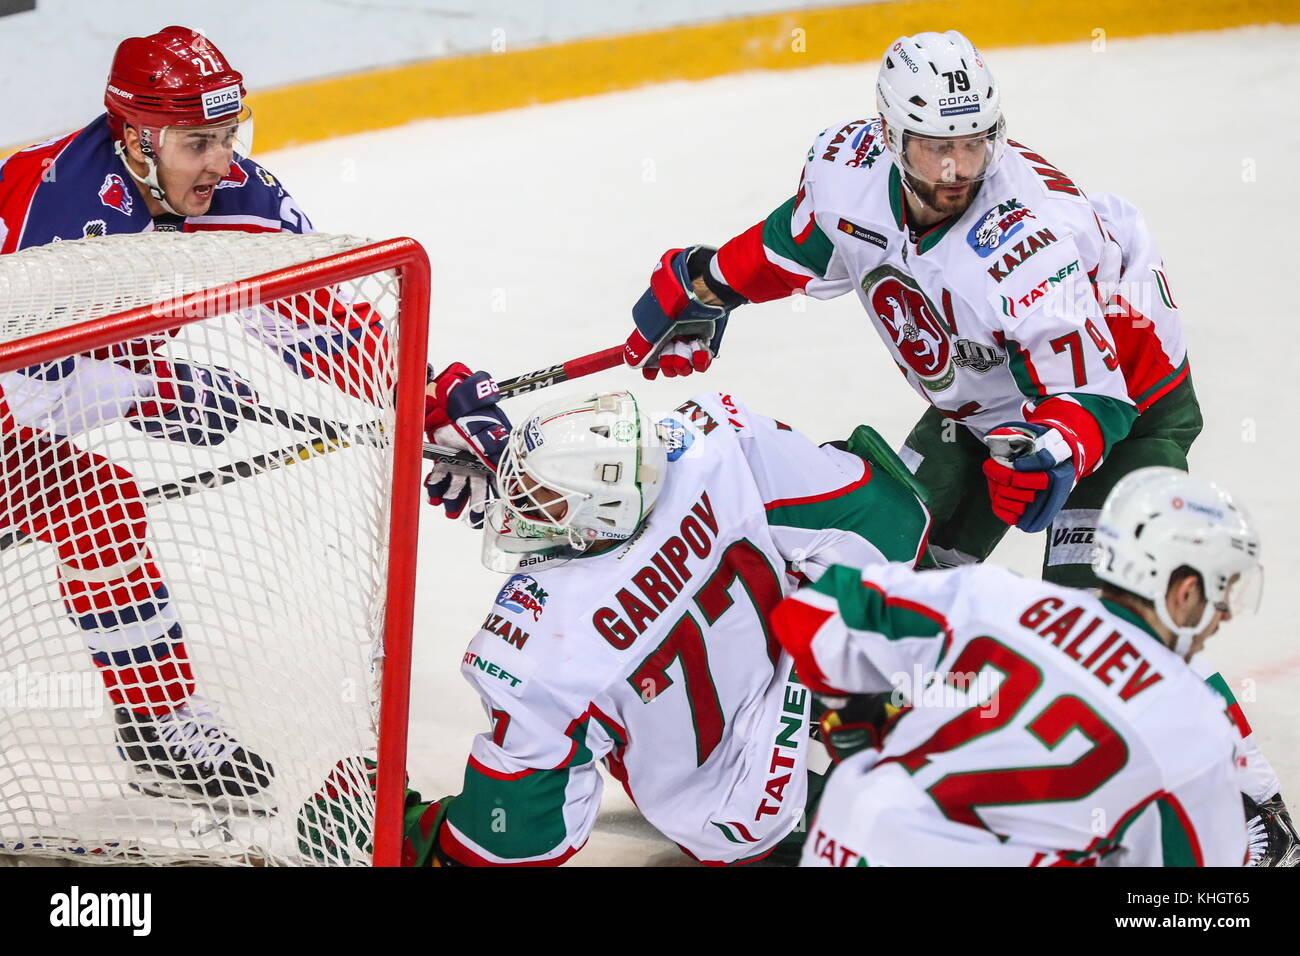 Moscow, Russia. 17th Nov, 2017. Ak Bars Kazan's Stanislav Galiyev, Andrei Markov, goaltender Emil Garipov defend - Stock Image